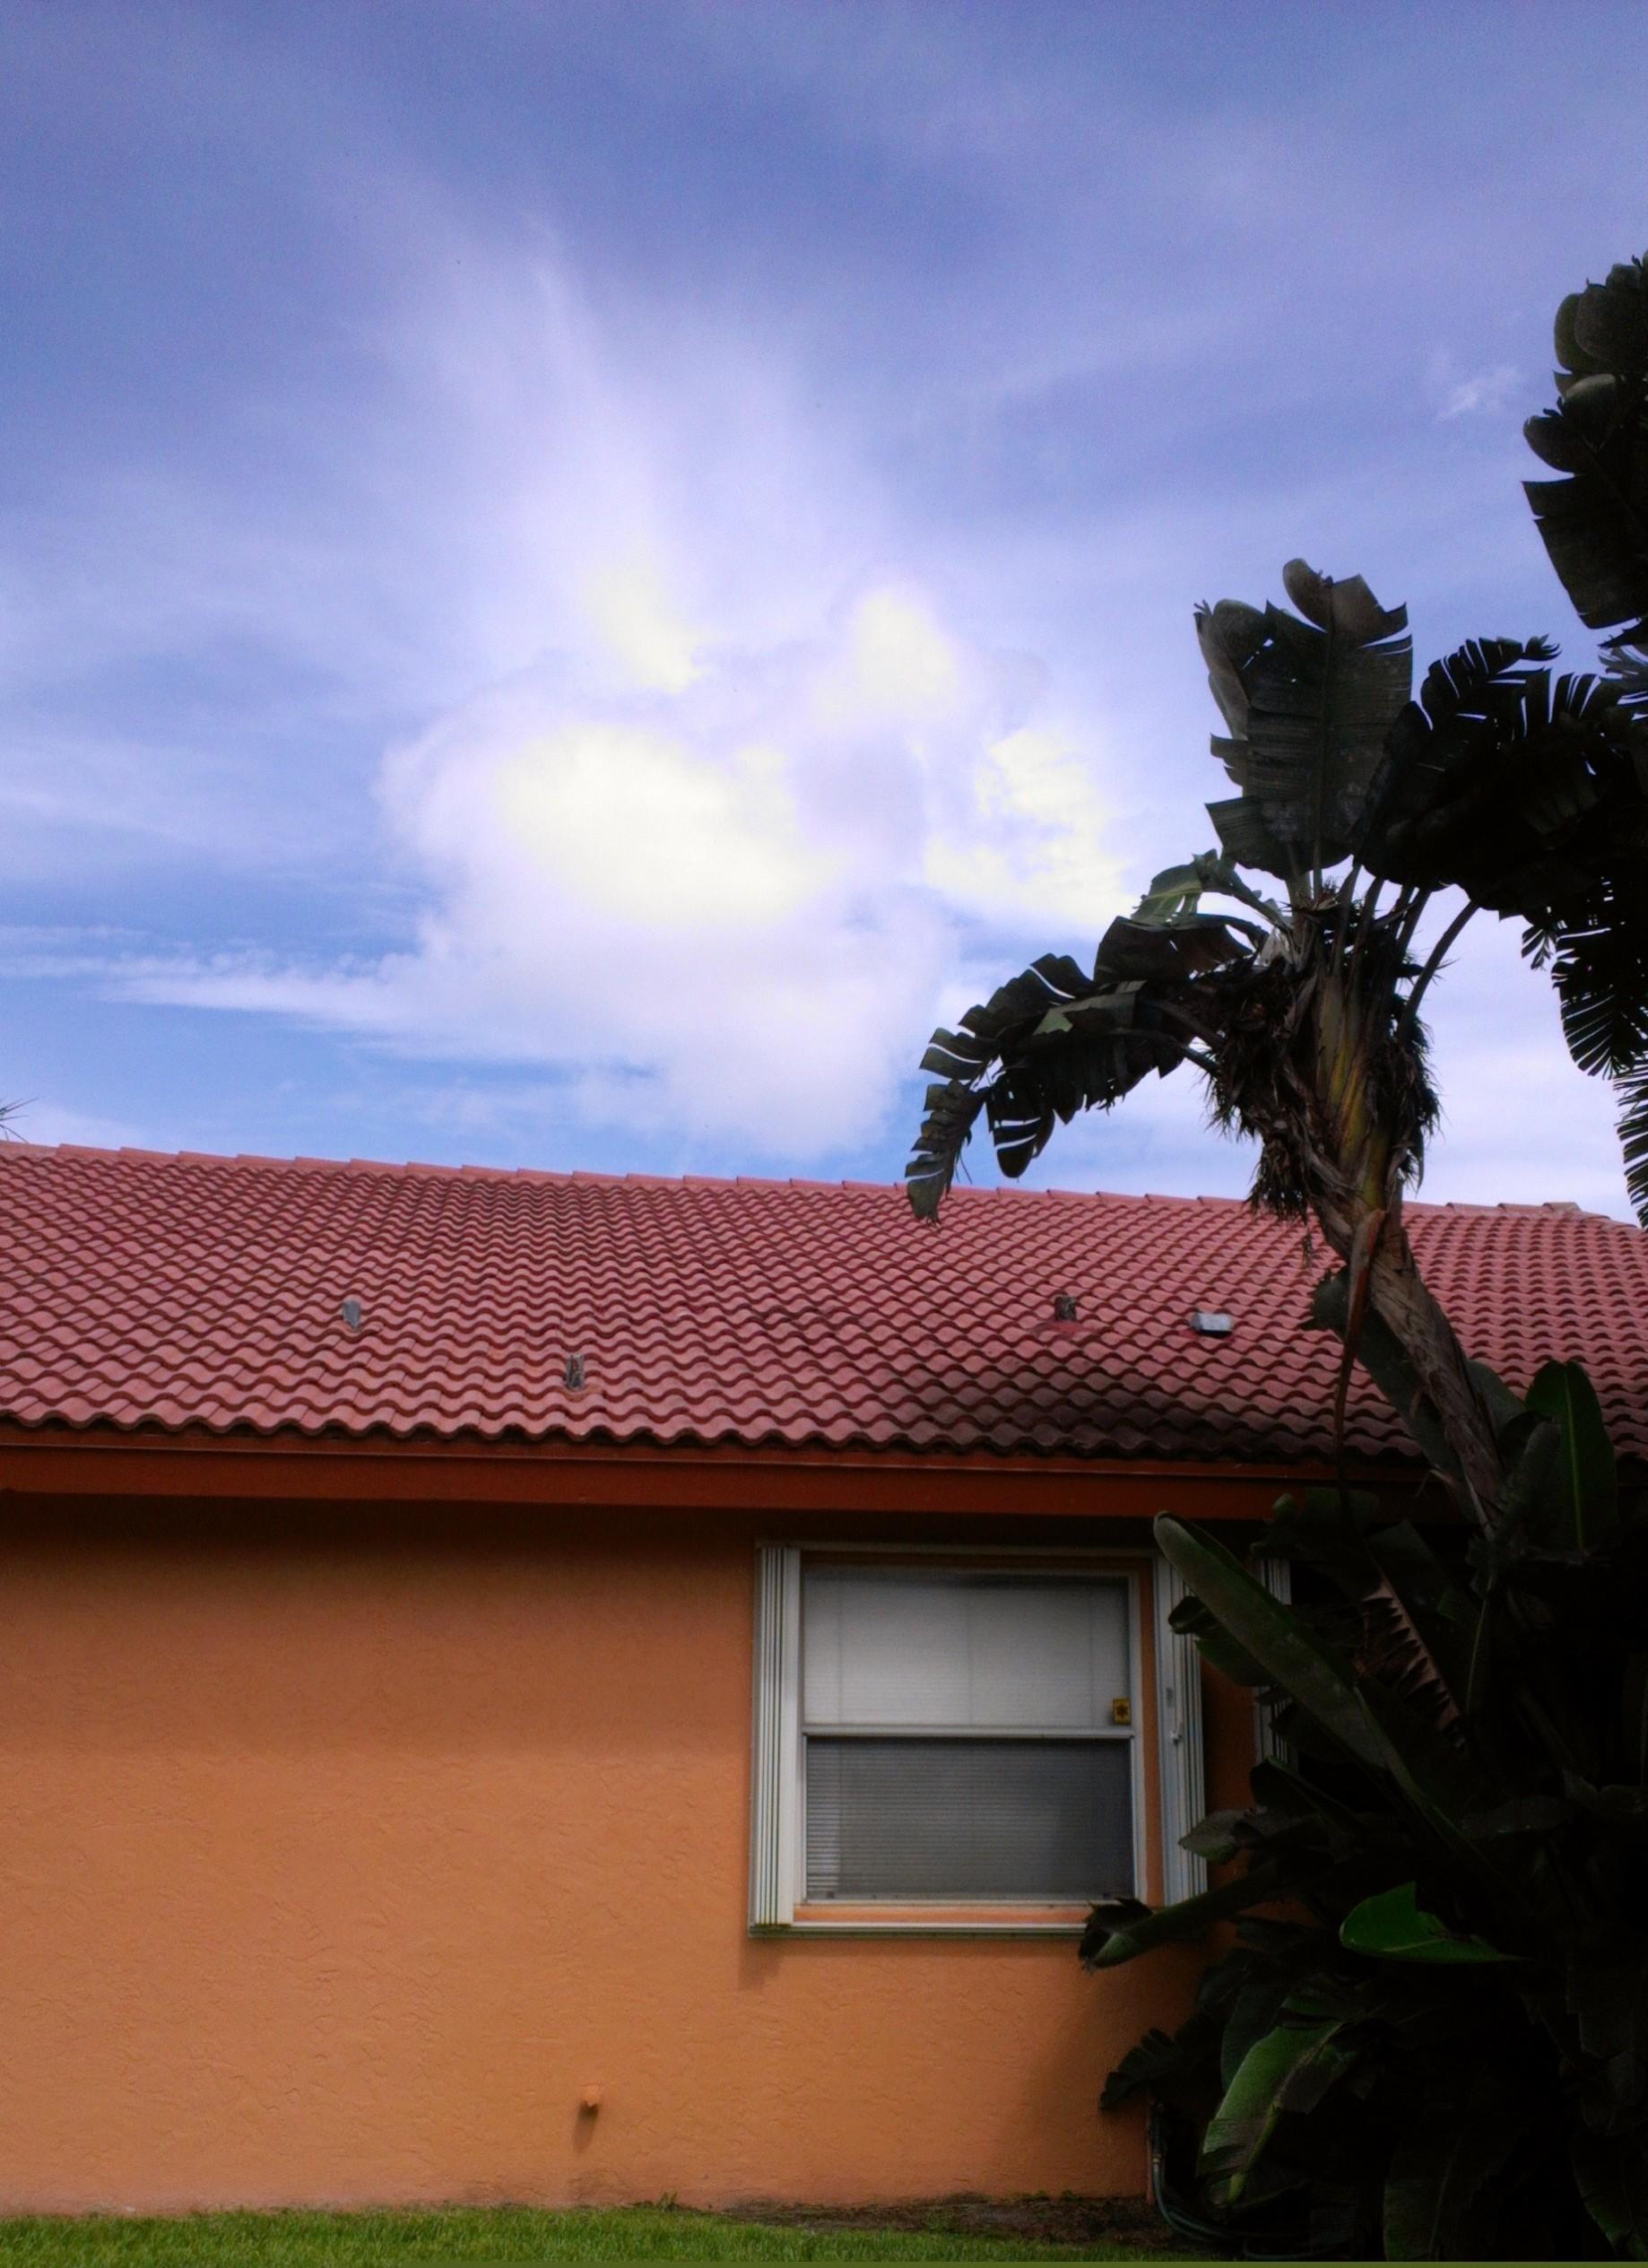 33 Roofing Repair KSppor Home